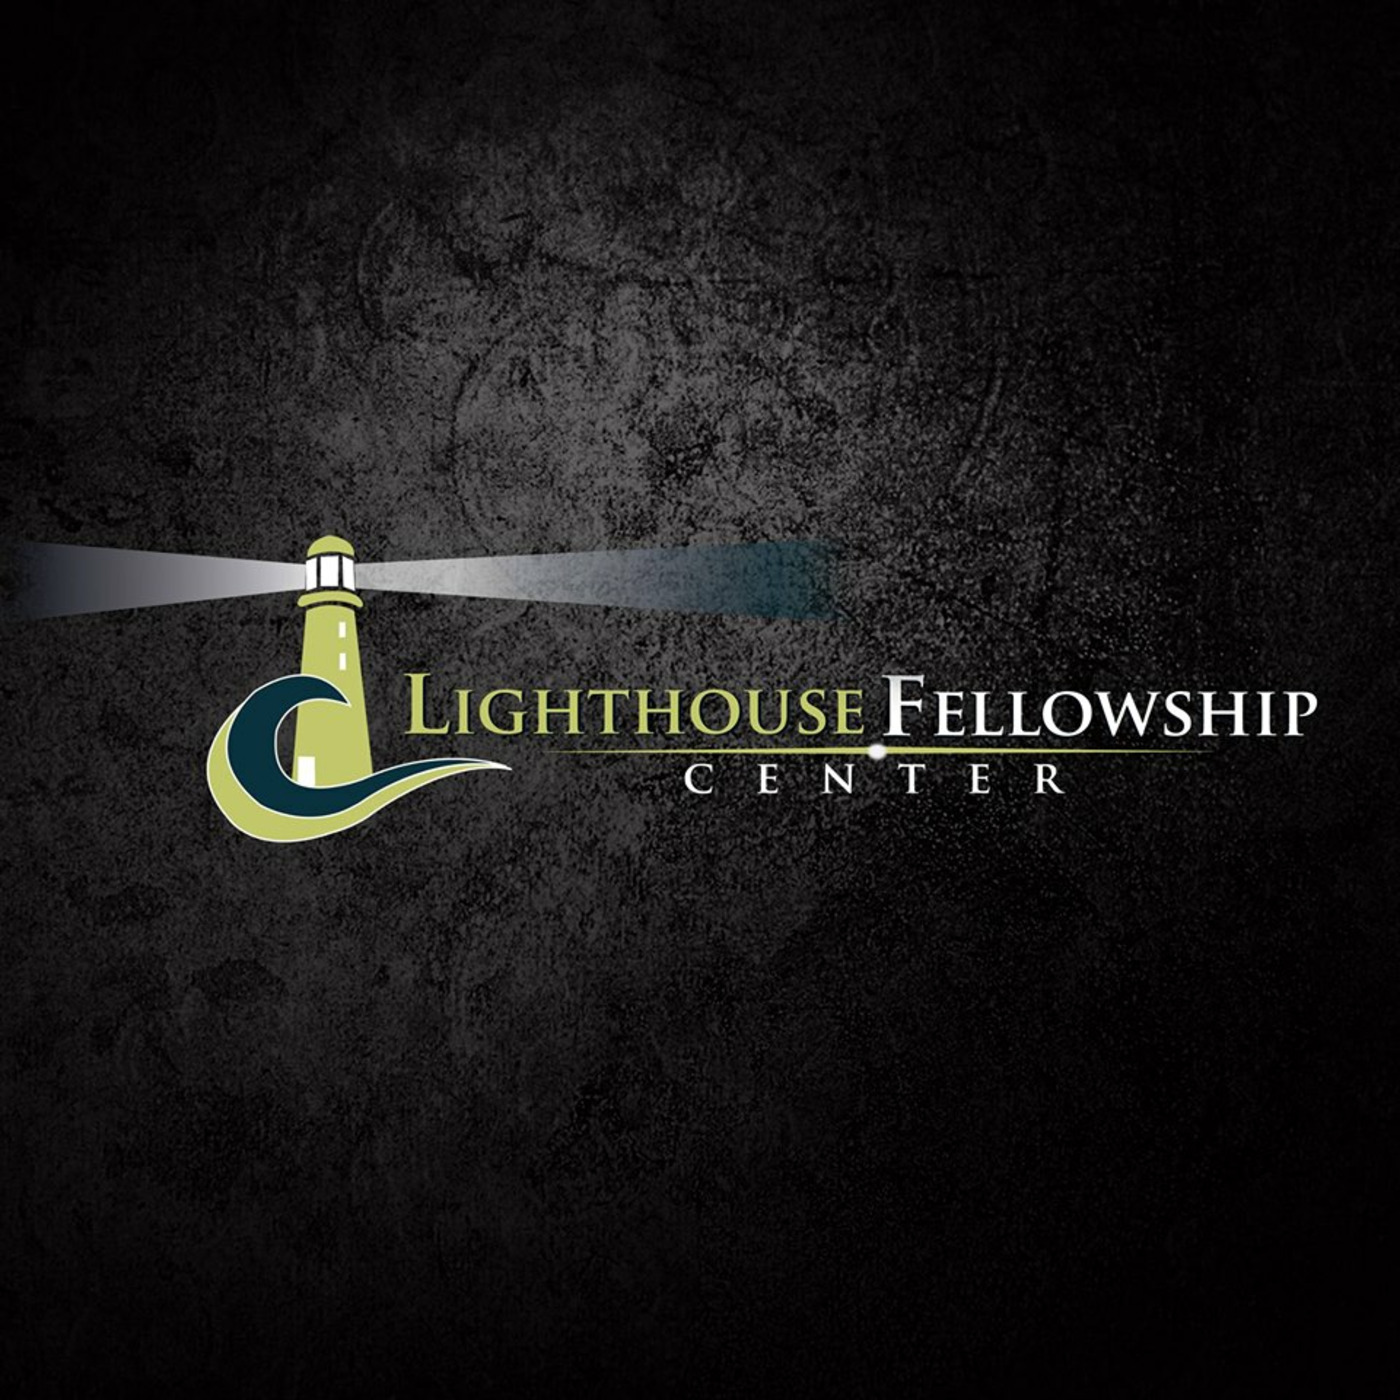 Lighthouse Fellowship Center